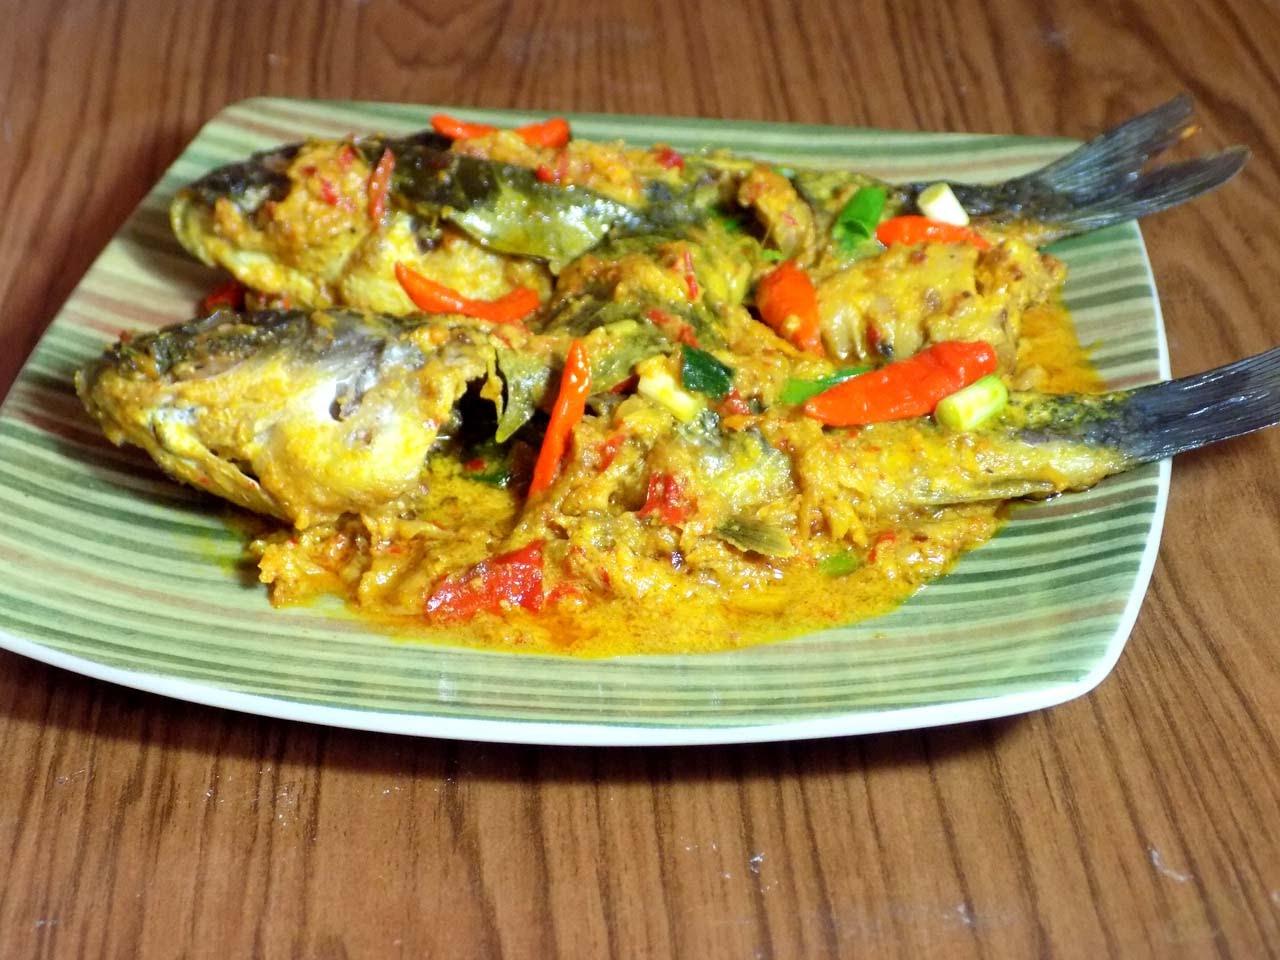 resep masakan ikan, Resep Masakan Ikan Mas Kuning Yang Wajib Dicoba